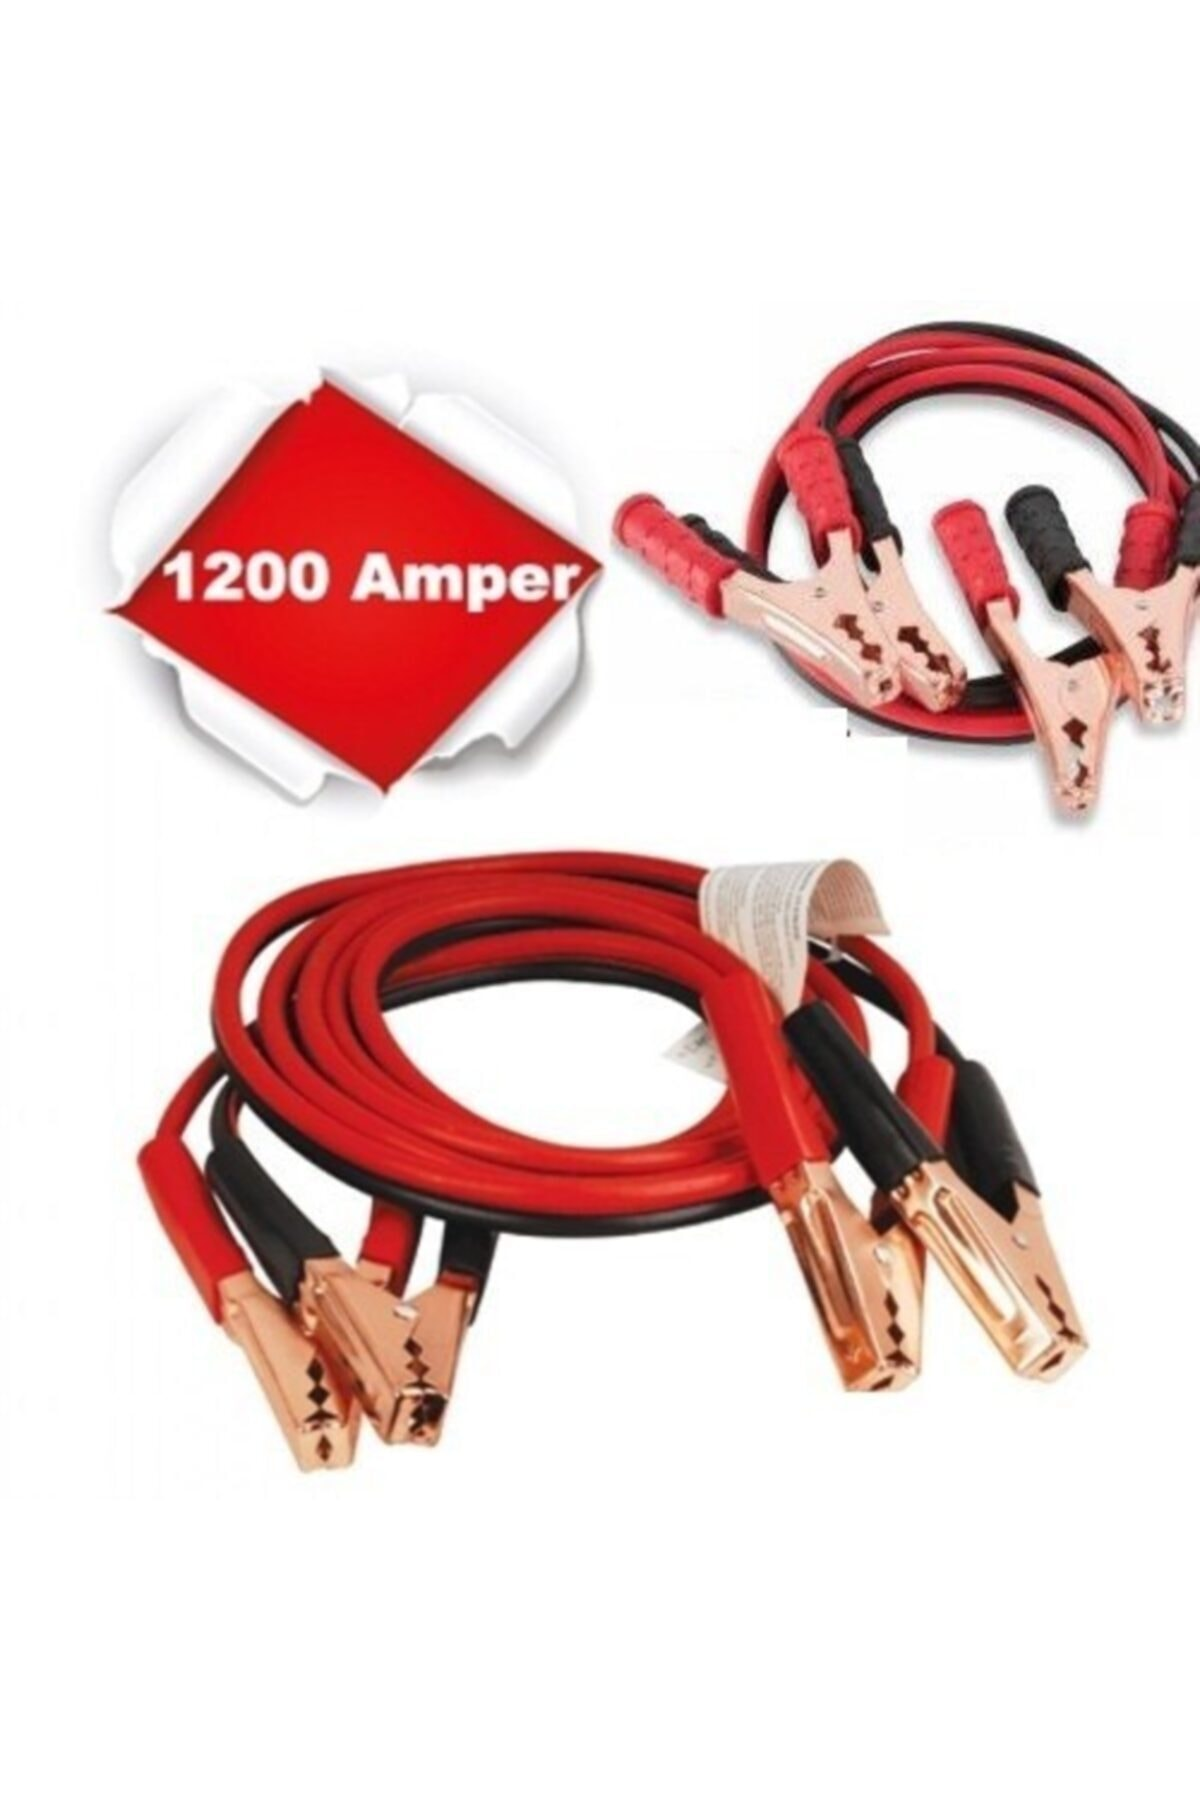 Arsimo Araç Akü Takviye Kablosu 1200 Amper 1